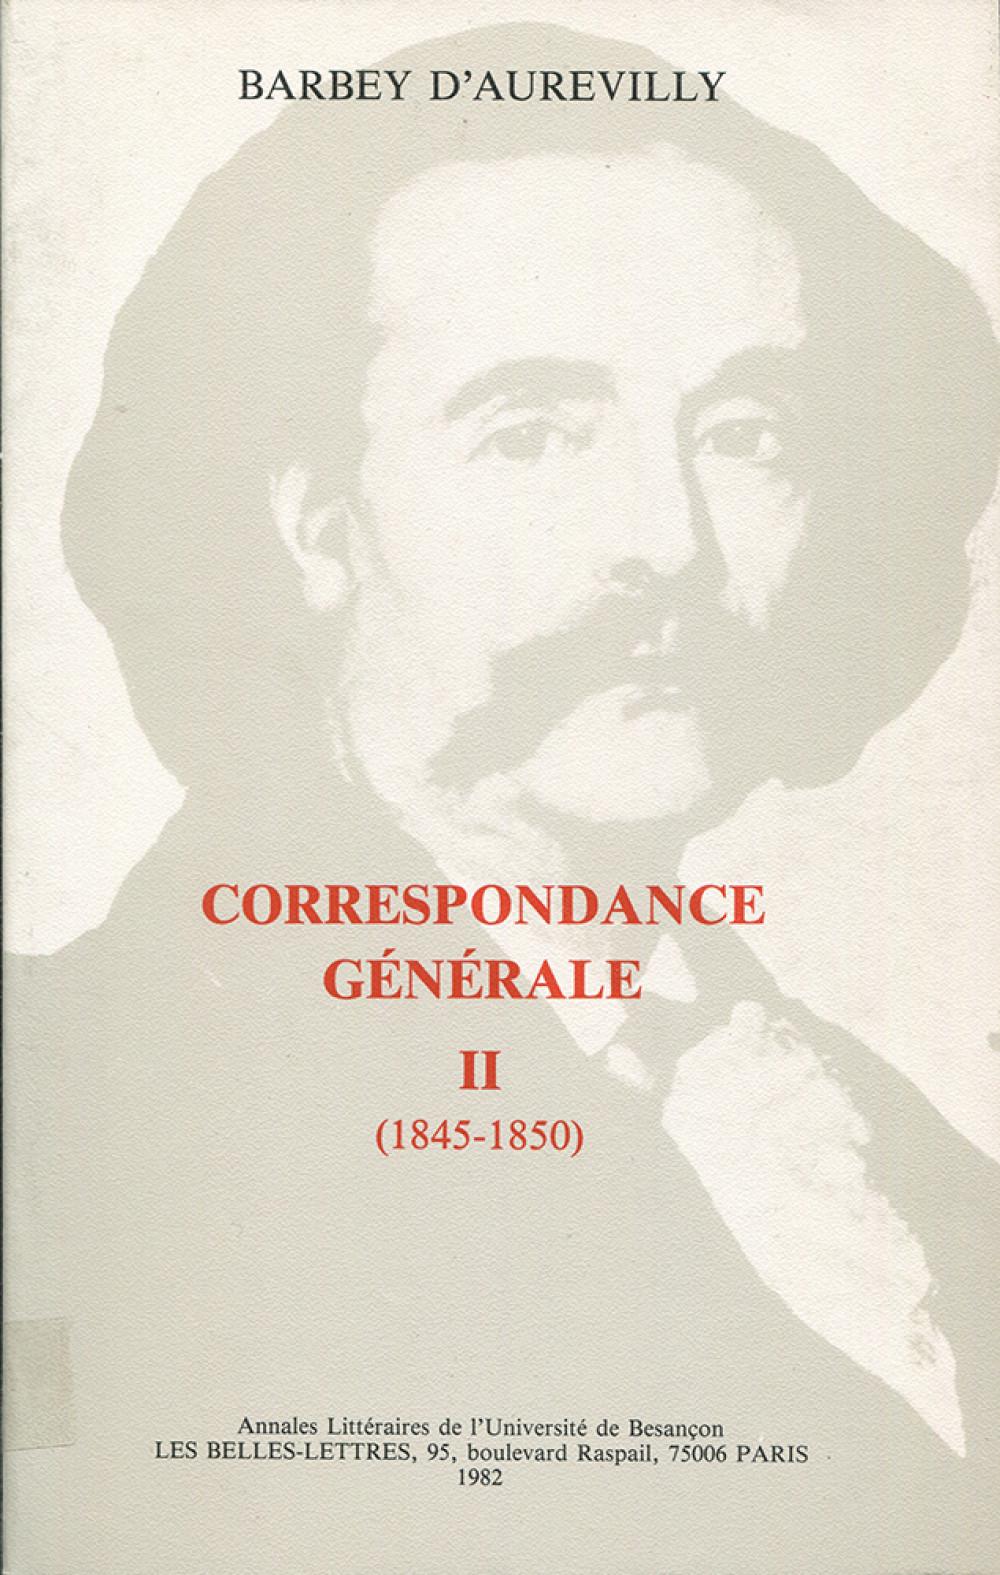 Barbey d'Aurevilly. Correspondance générale II (1845-1850)